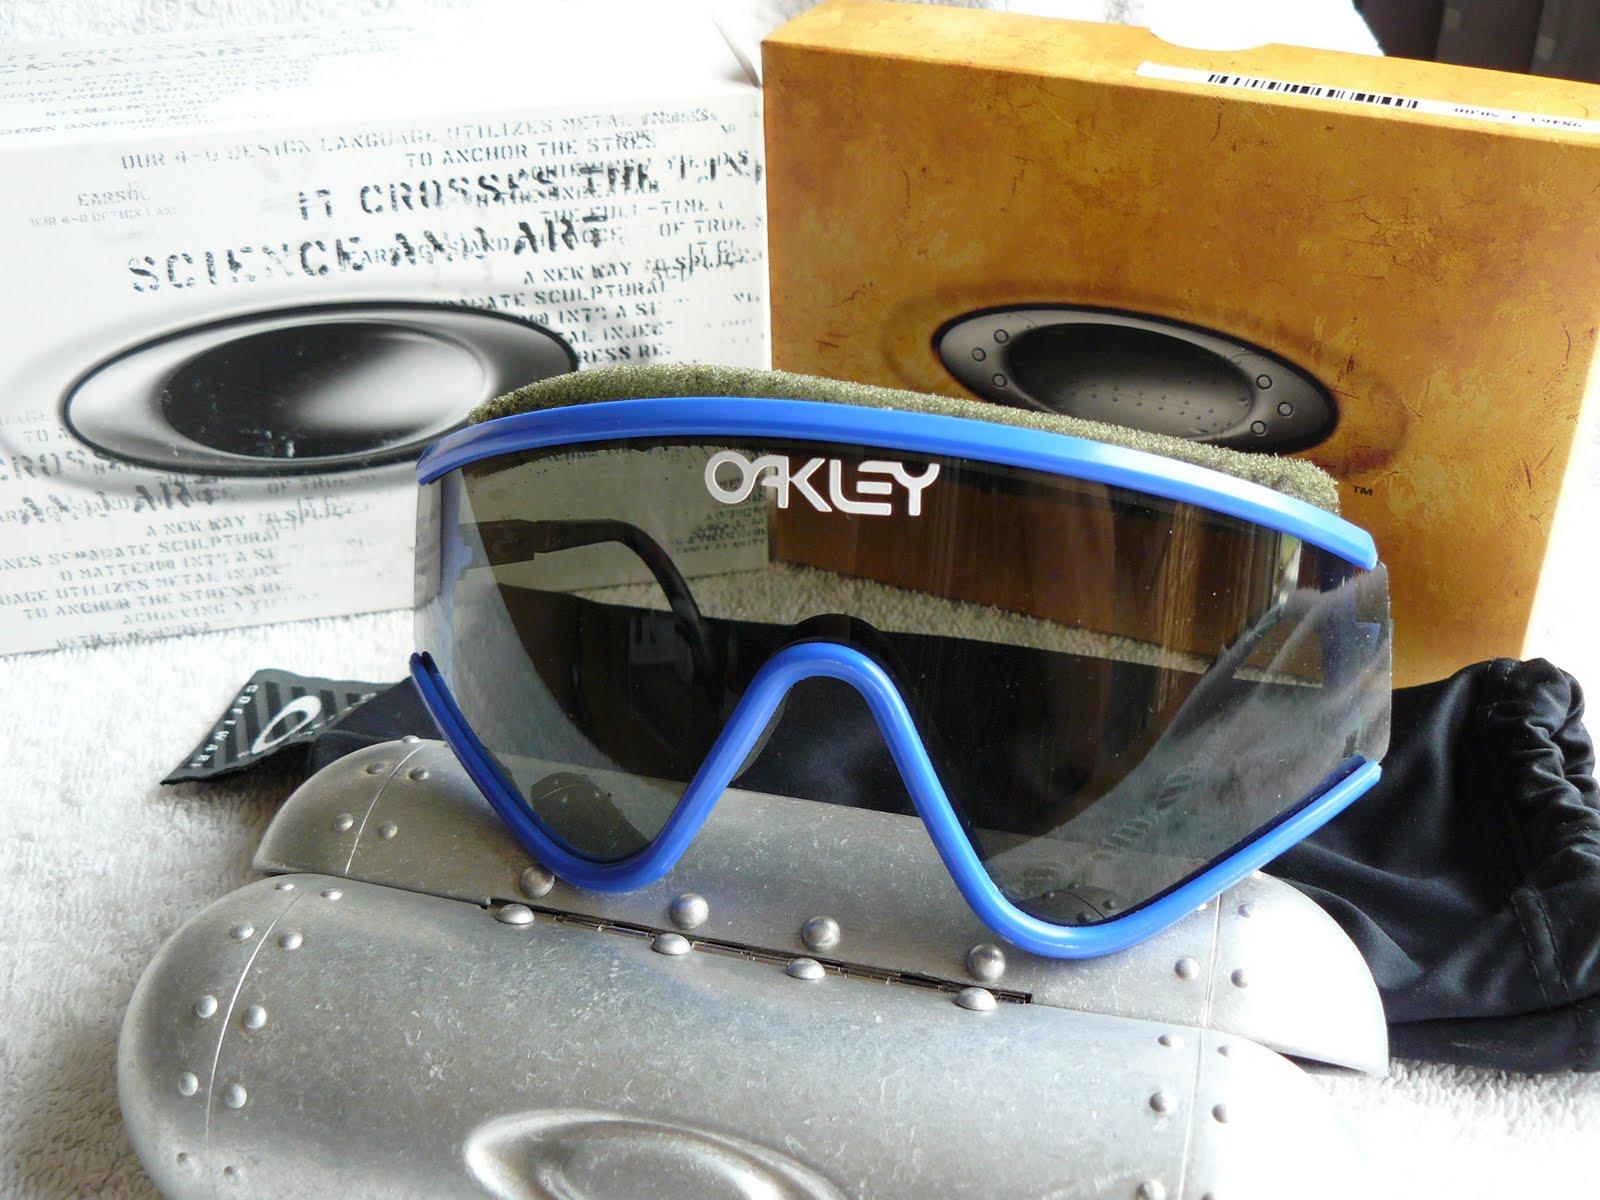 fc859ff96b75 Me and my Oakley: My Vintage Oakleys